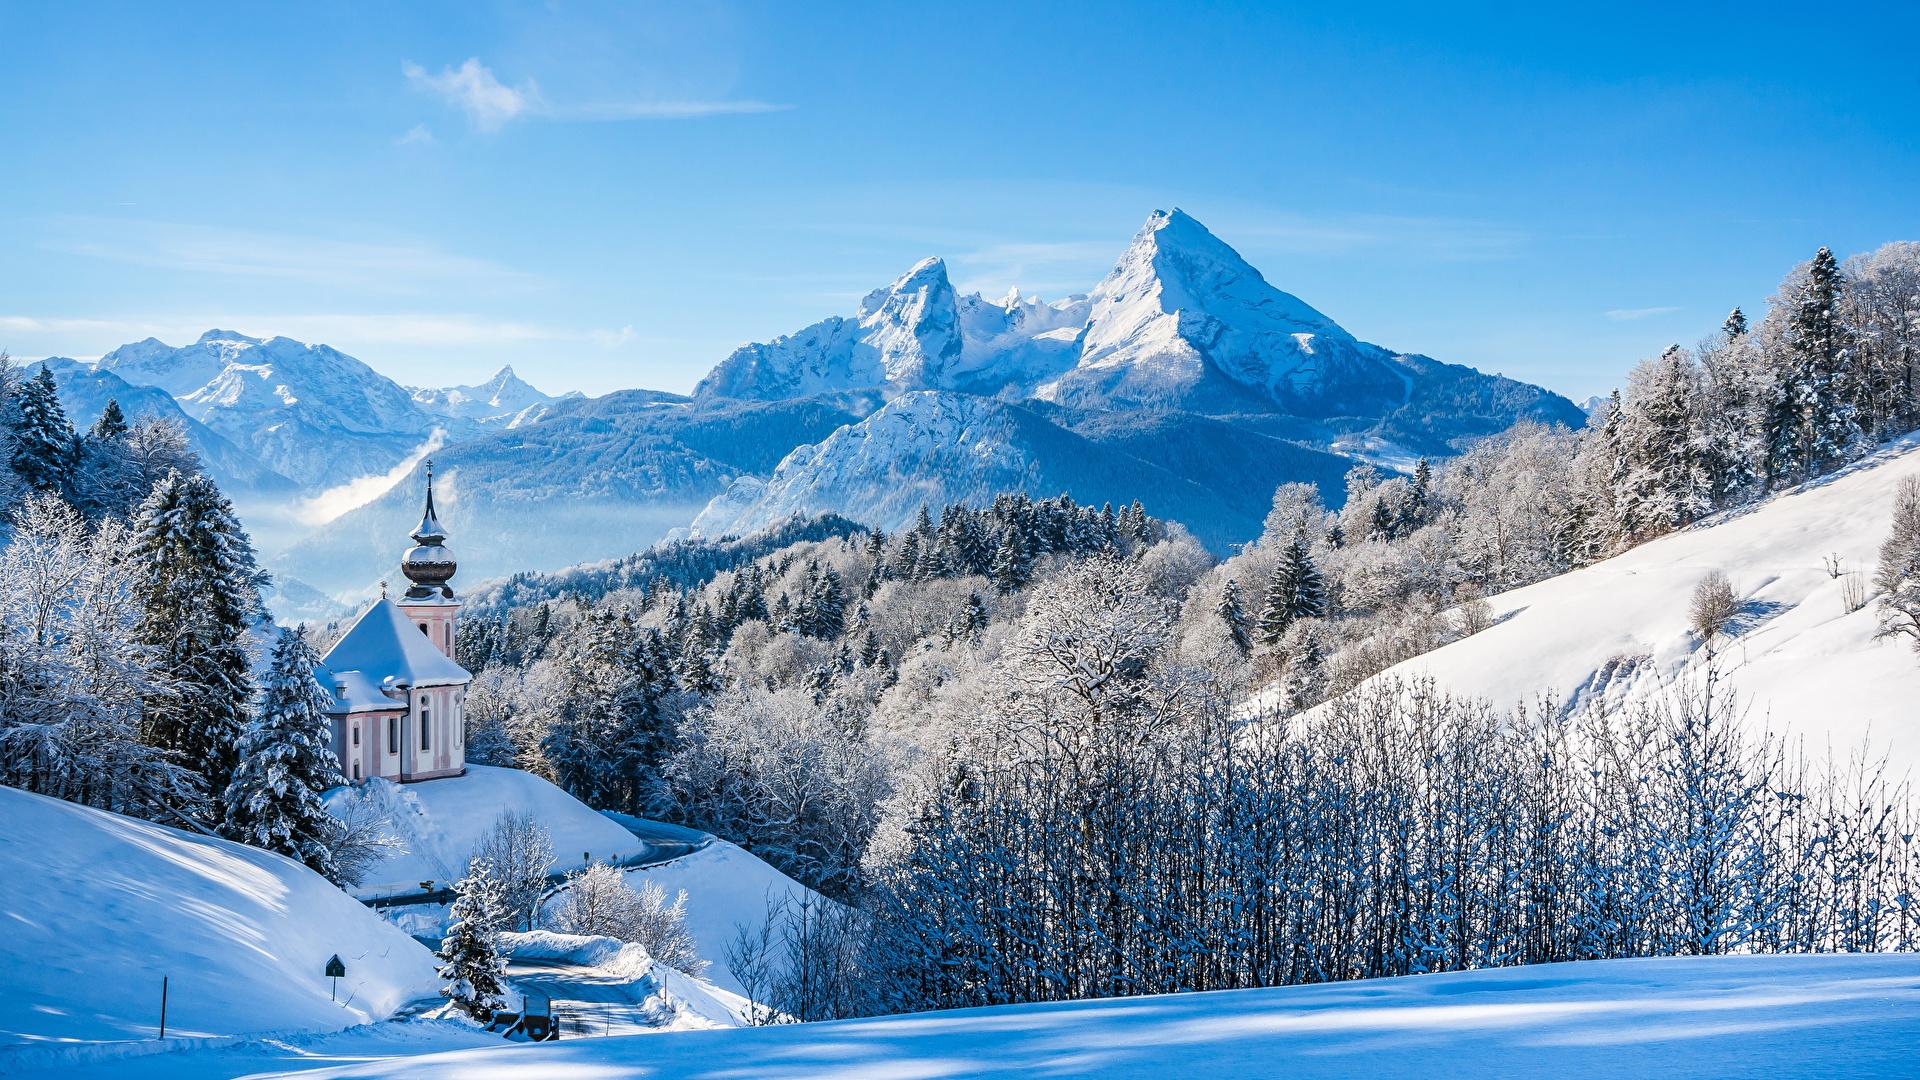 Immagine Baviera Alpi Germania Natura Inverno Montagne 1920x1080